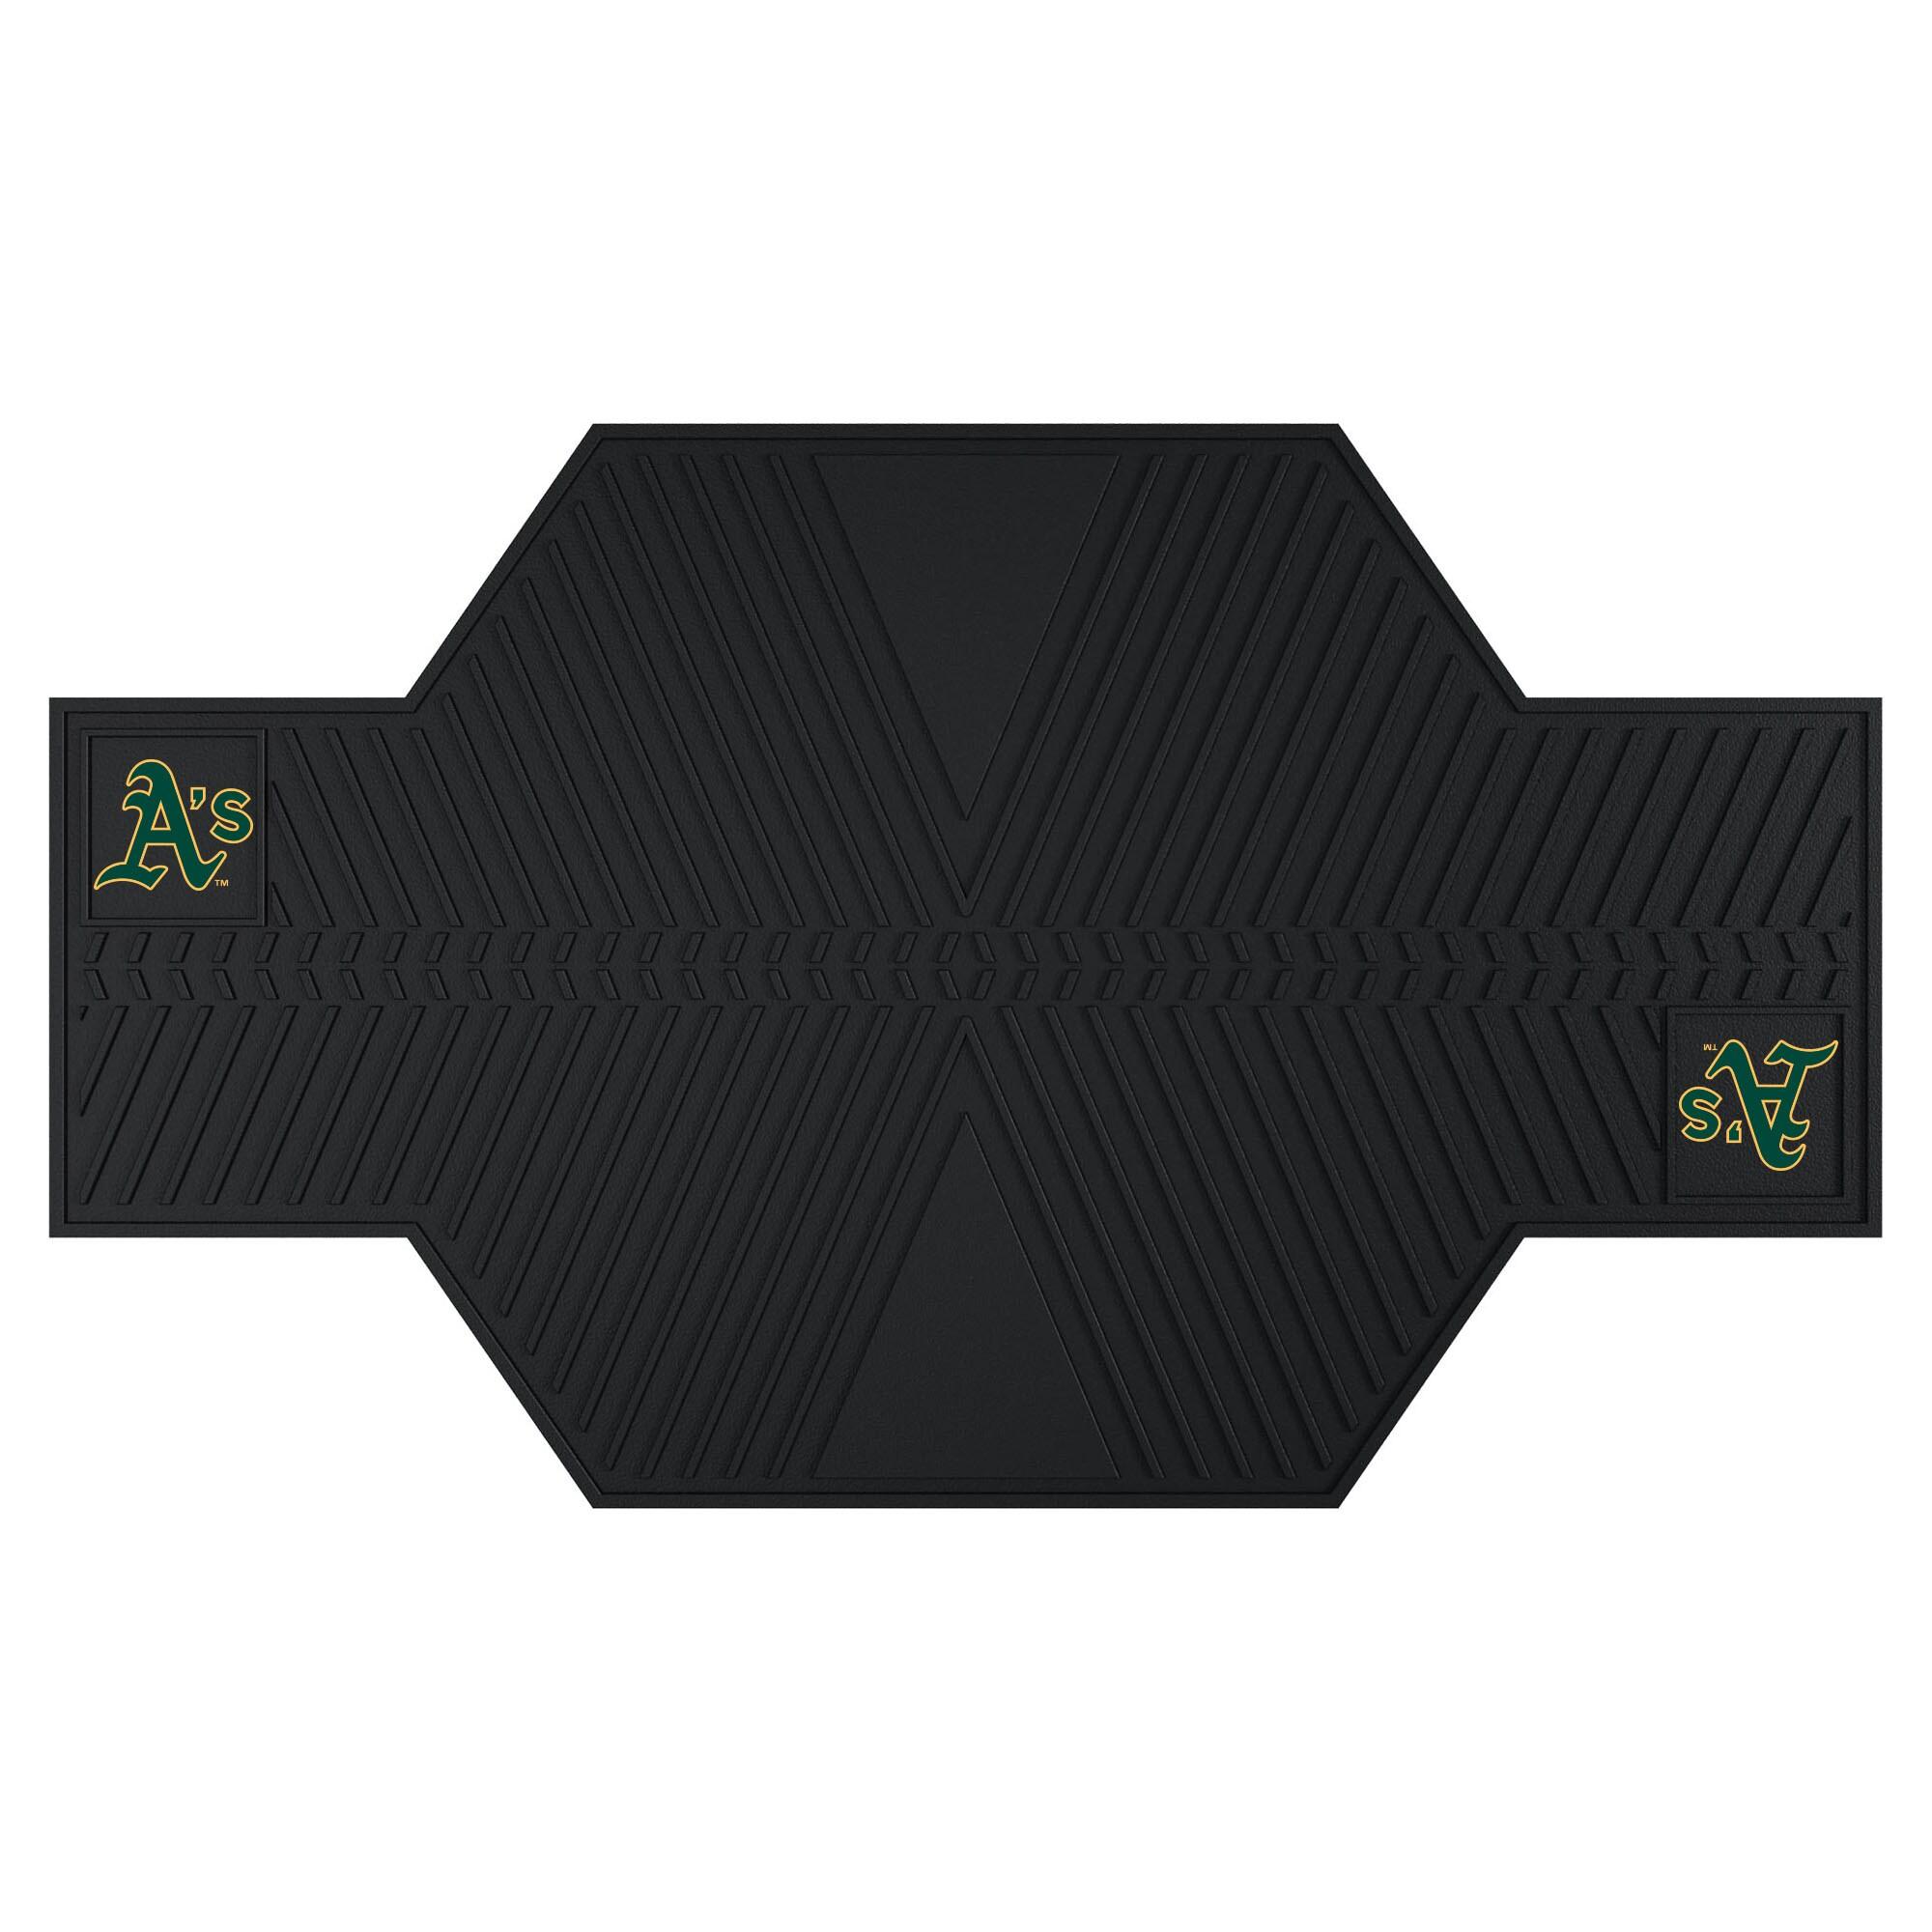 Oakland Athletics Motorcycle Mat